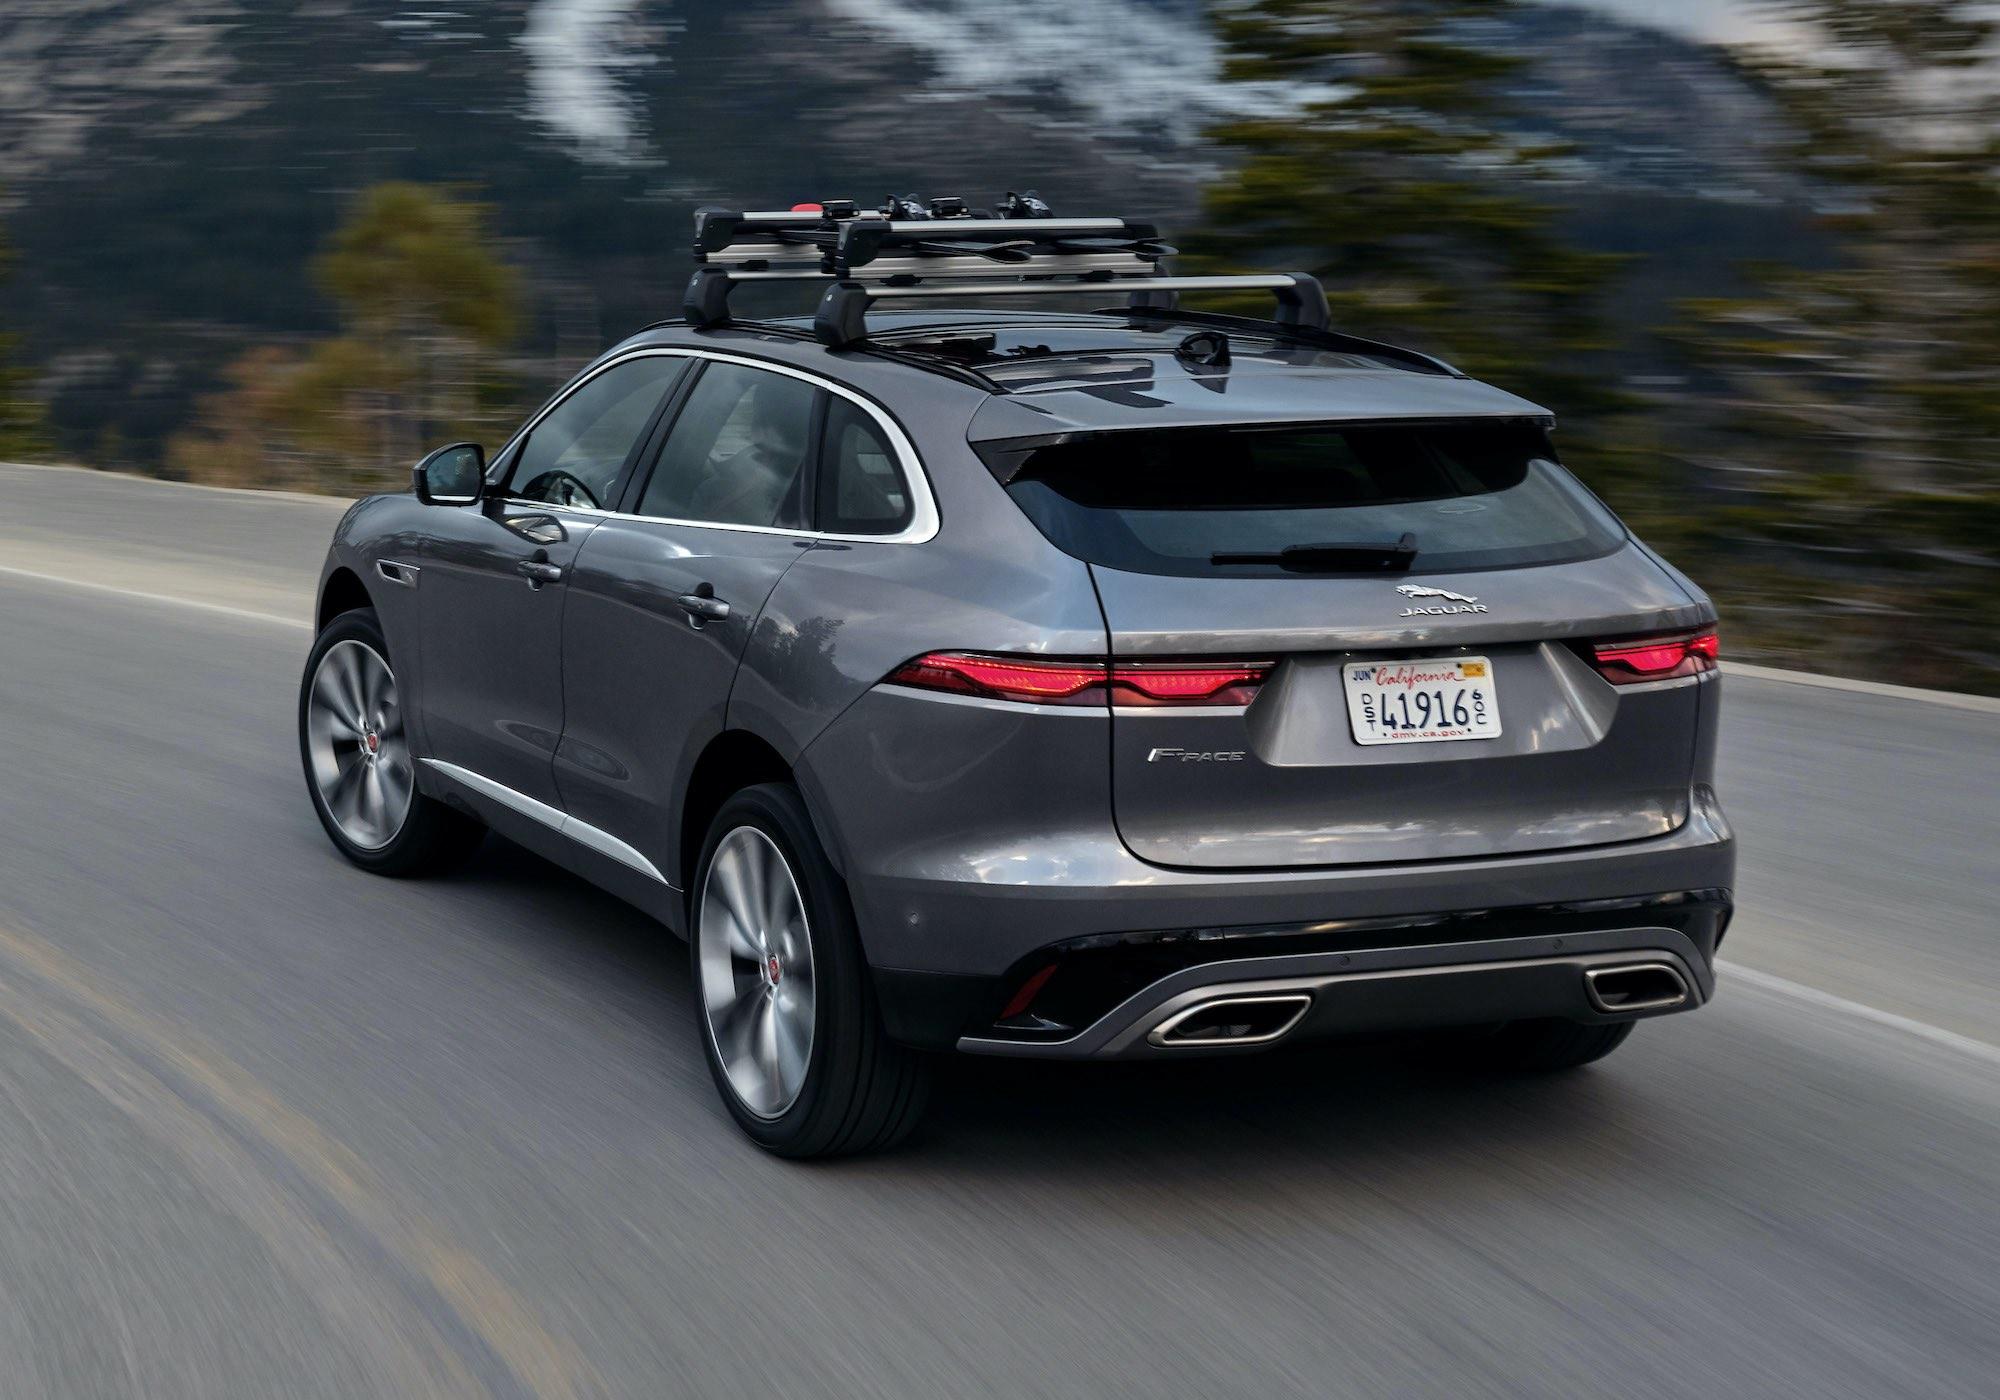 Jaguar F-Pace lifting